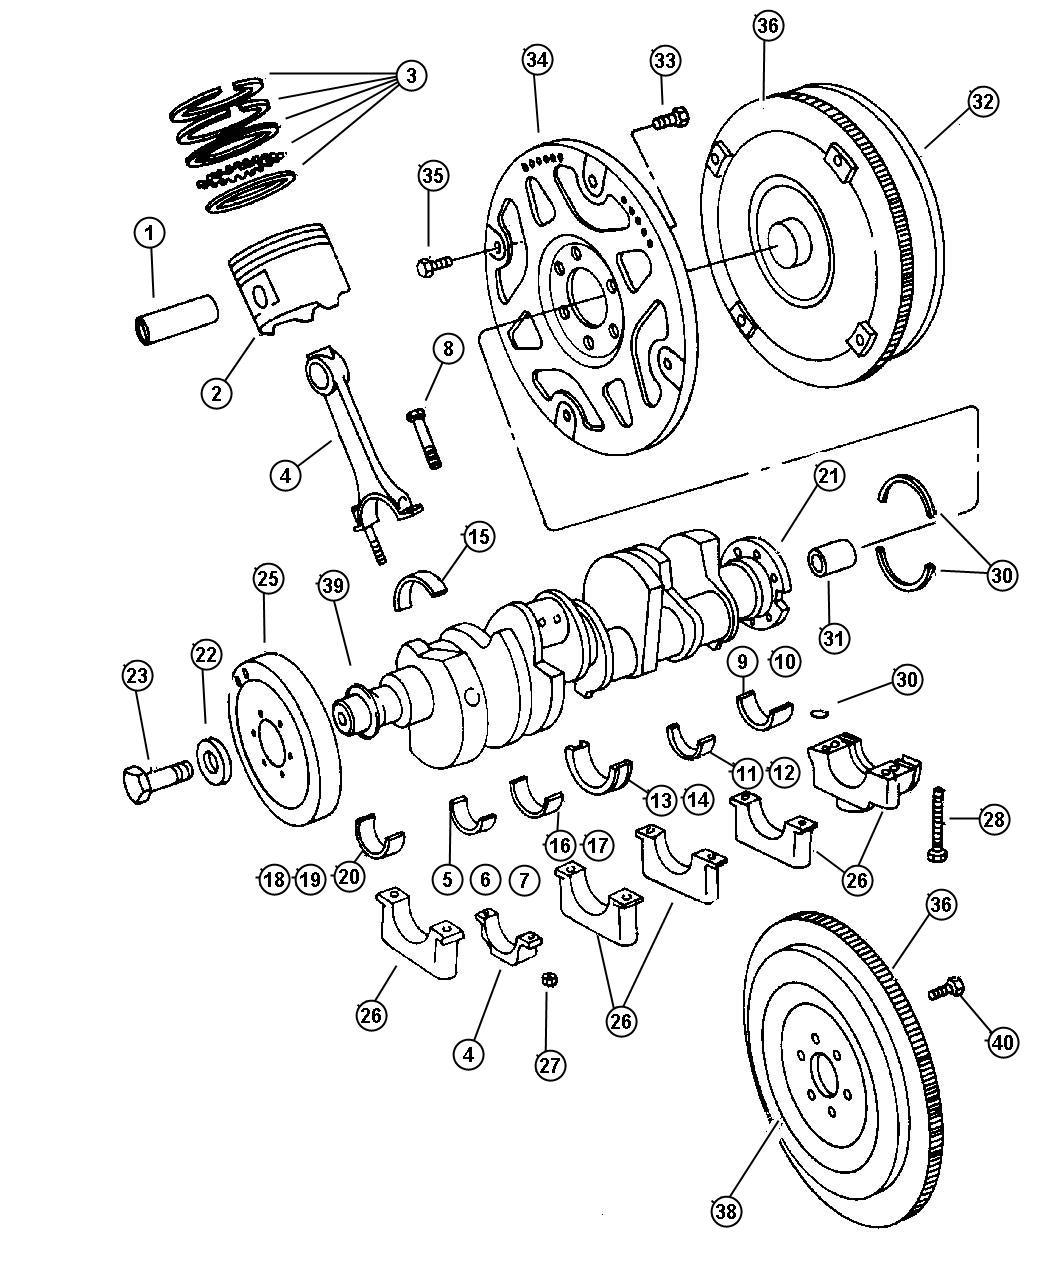 Dodge Ram 1500 Gear. Flywheel ring. Crew cab, manual